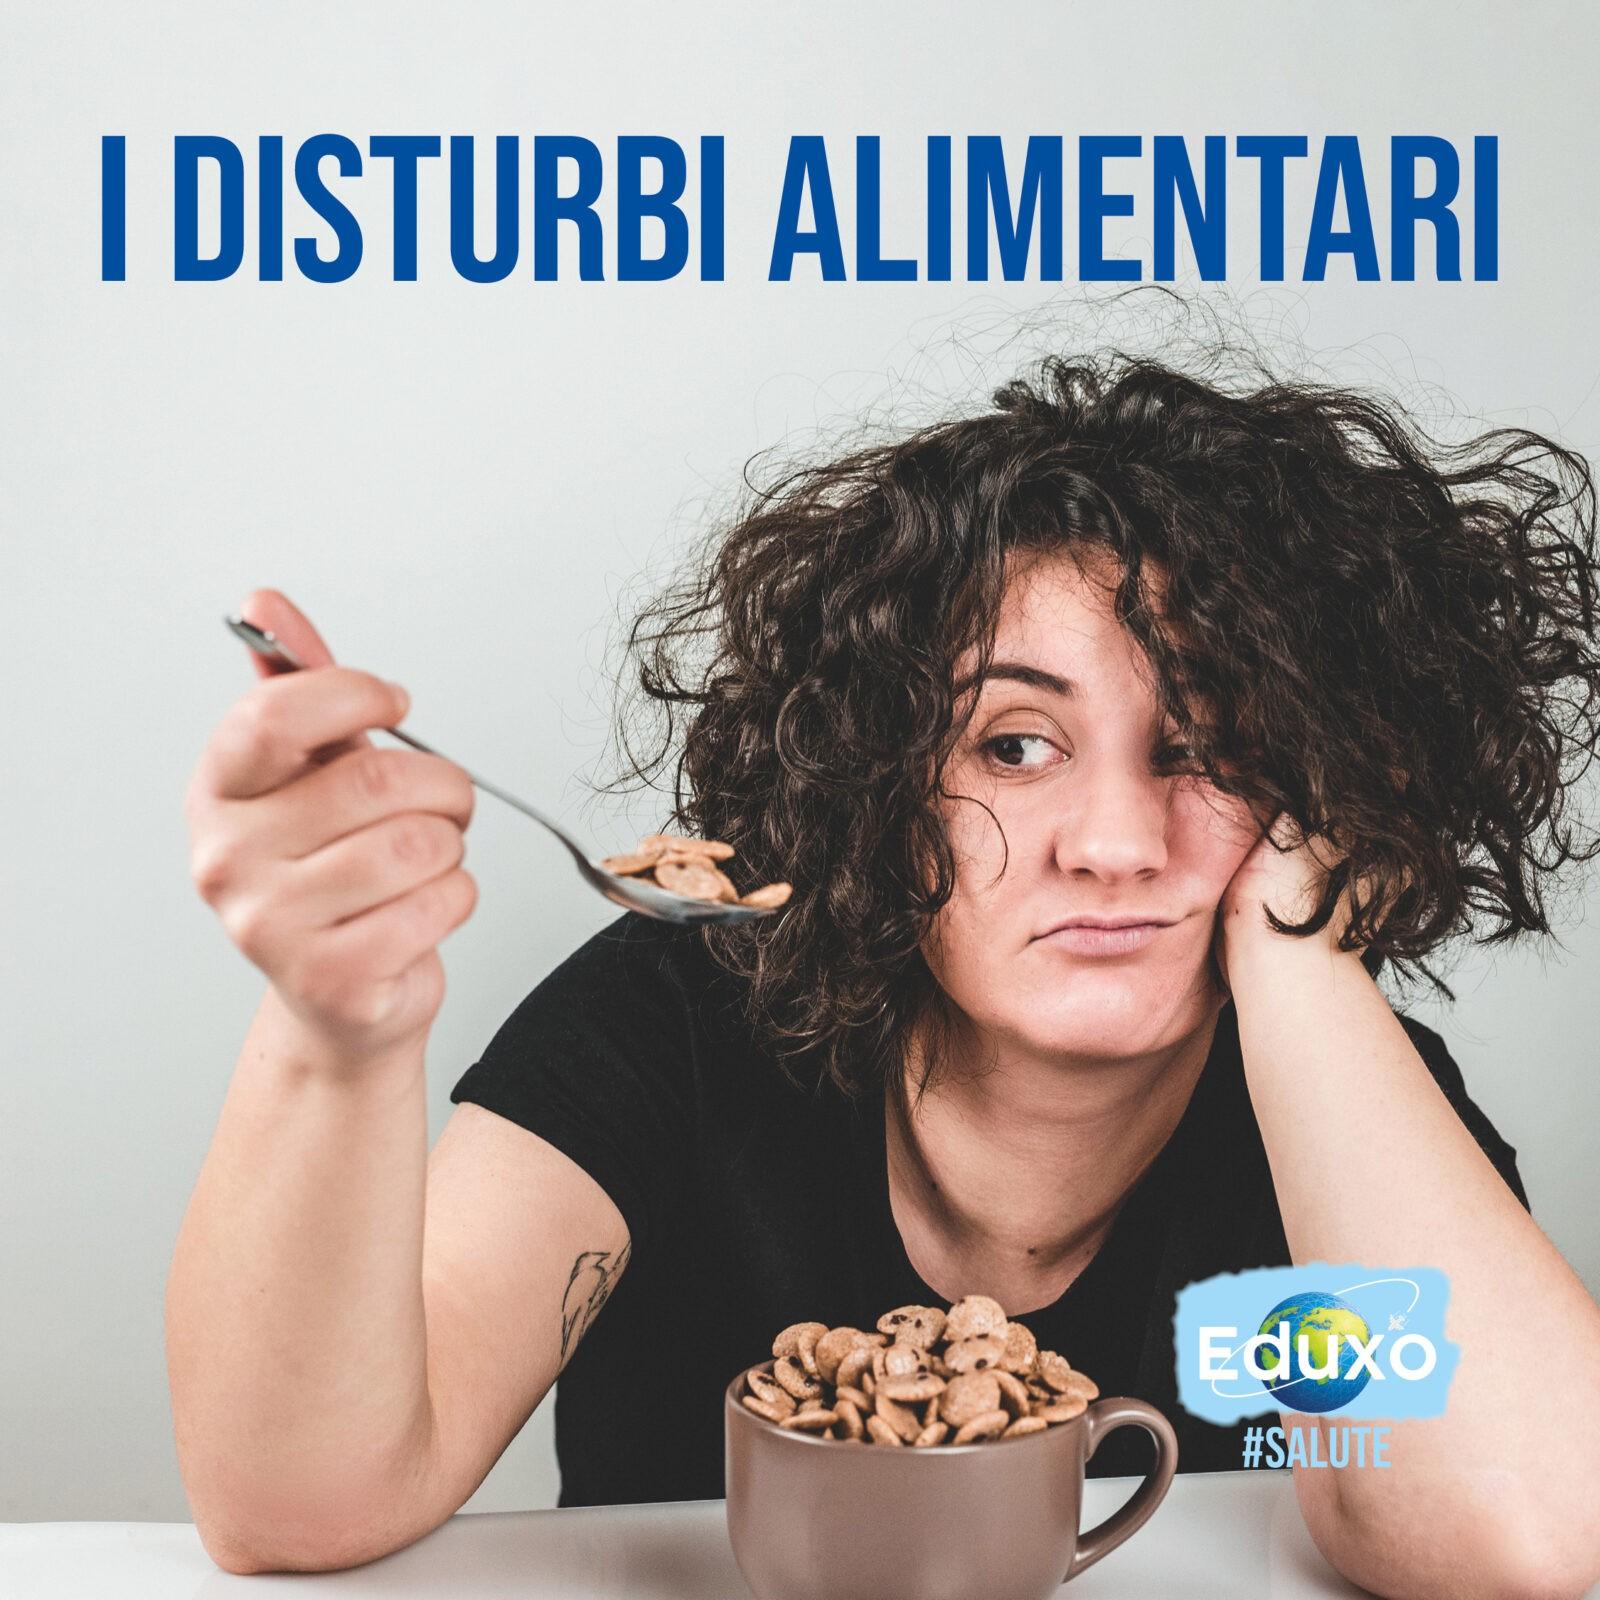 I disturbi alimentari